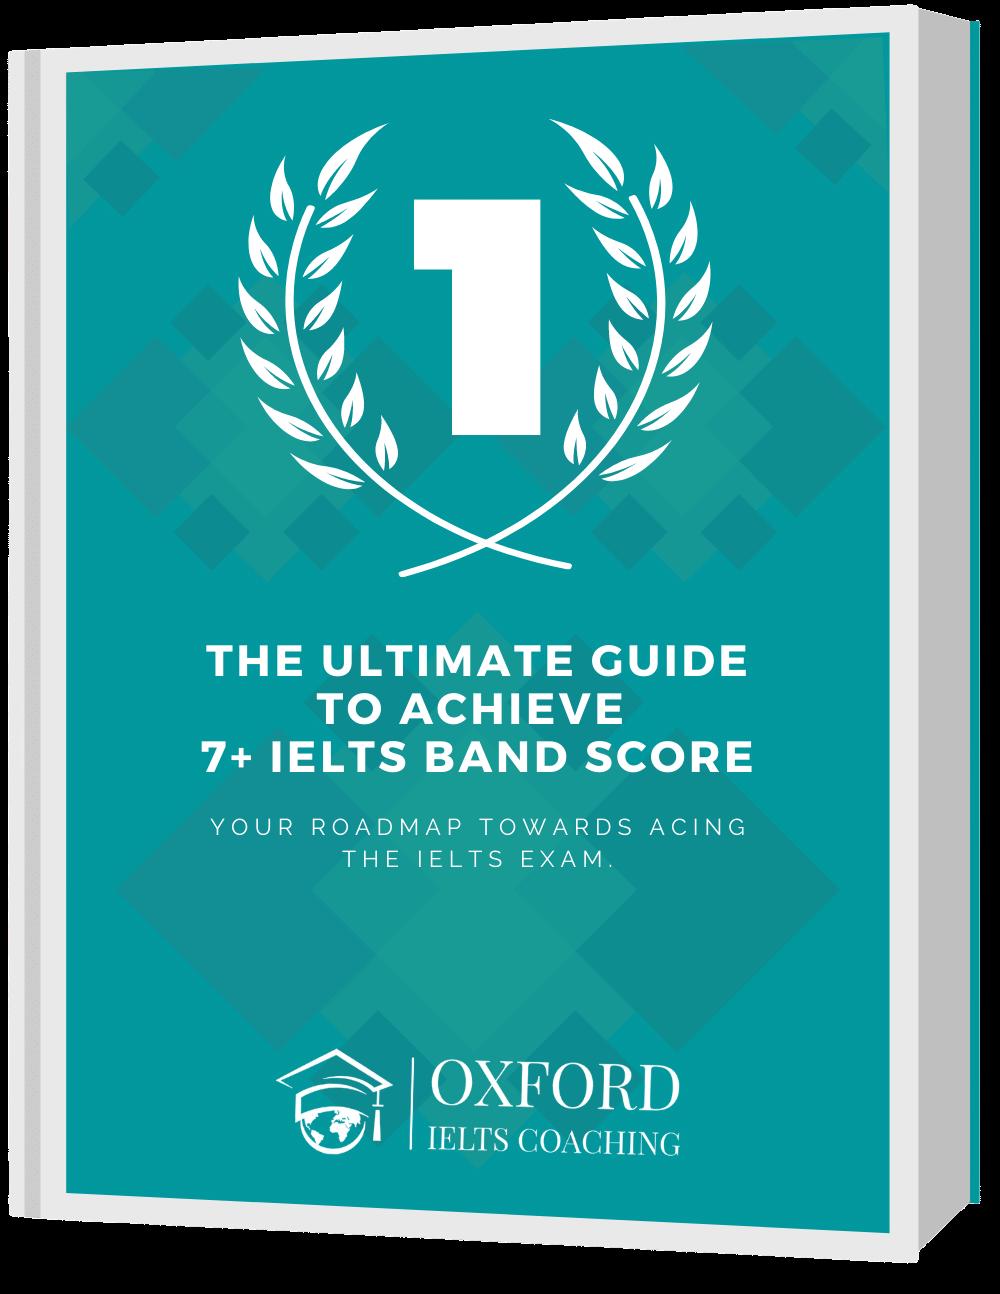 ielts guide download free